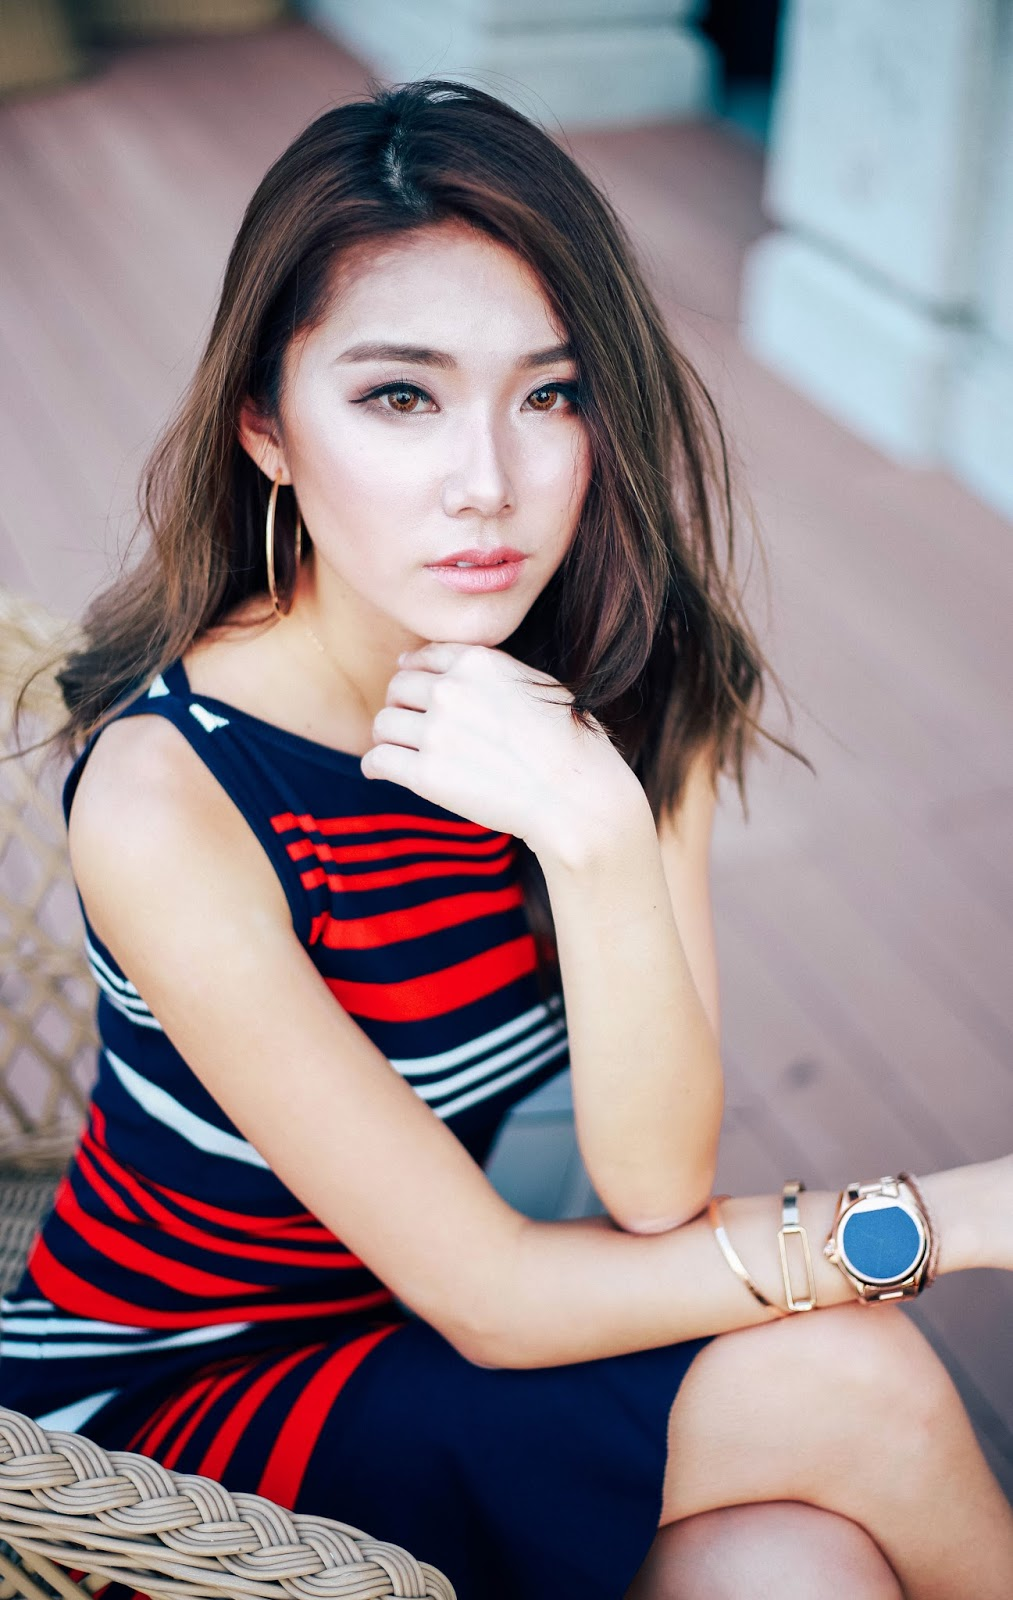 portrait, inspo, rose gold watch, styling, ralph lauren, dress, 2016, fall